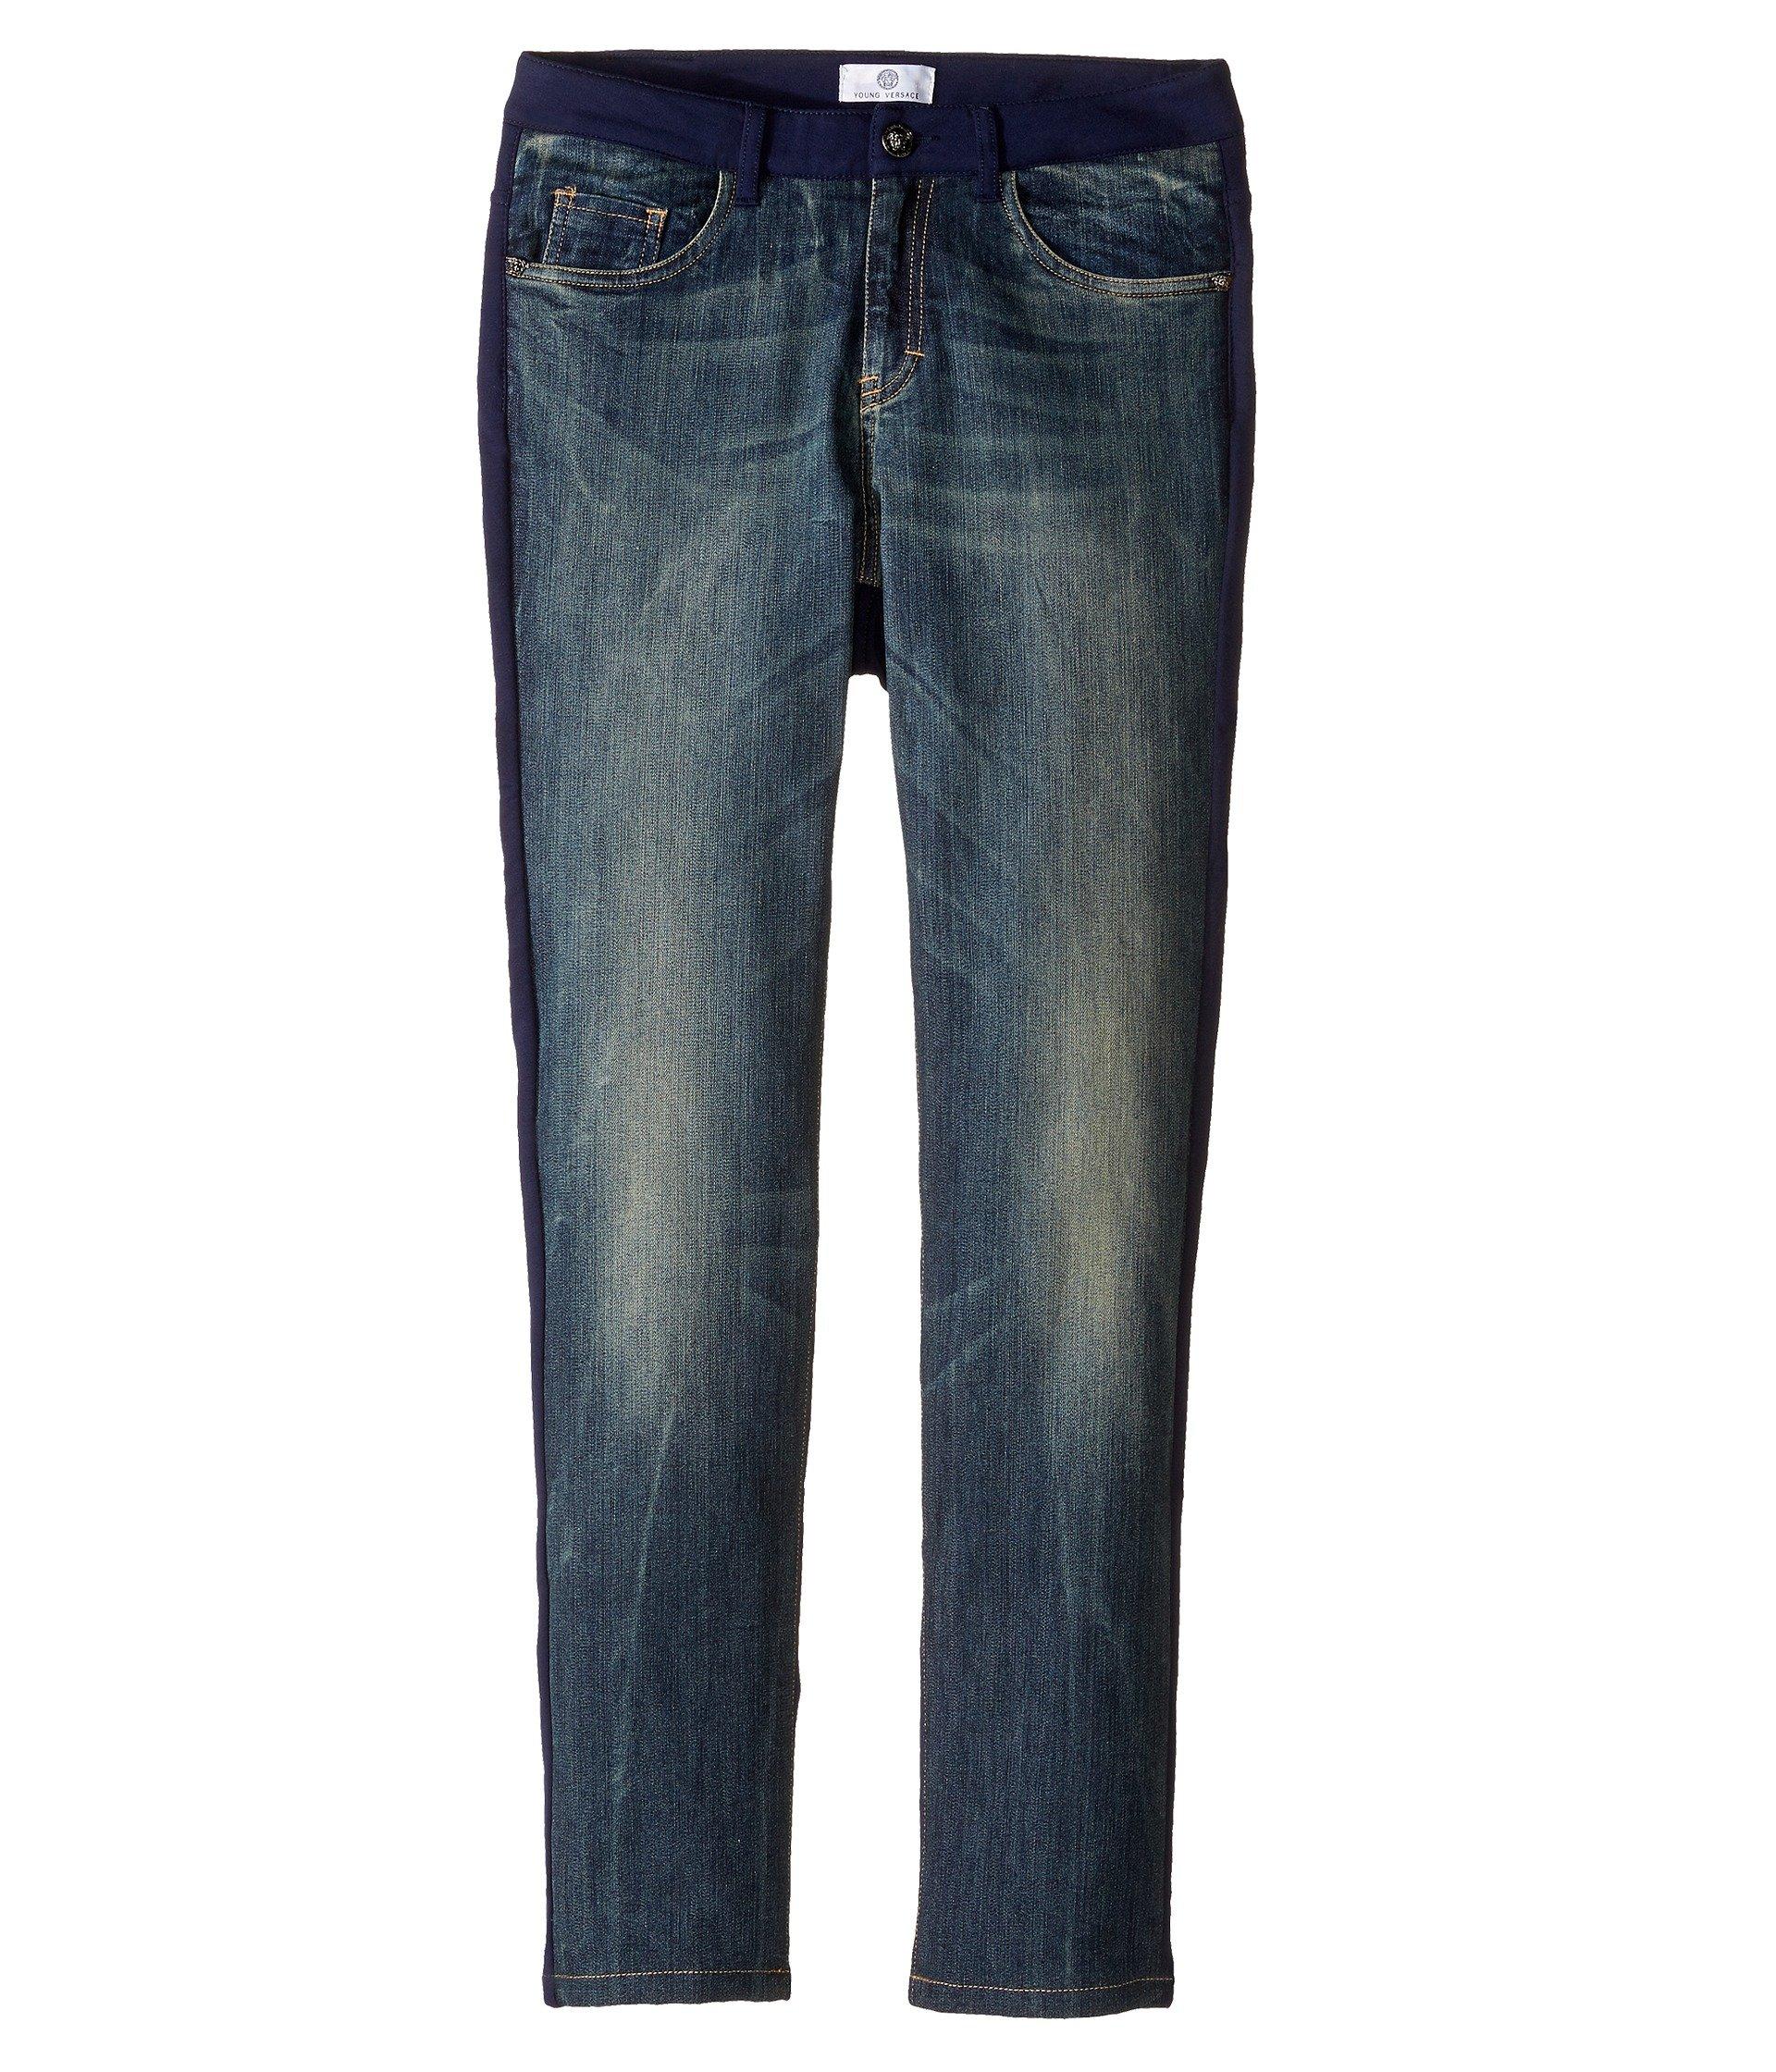 Versace Kids Boys' Denim and Sweat Mixed Fabric Pants (Big Kids), Denim Blue, 13/14 Years X One Size by Versace